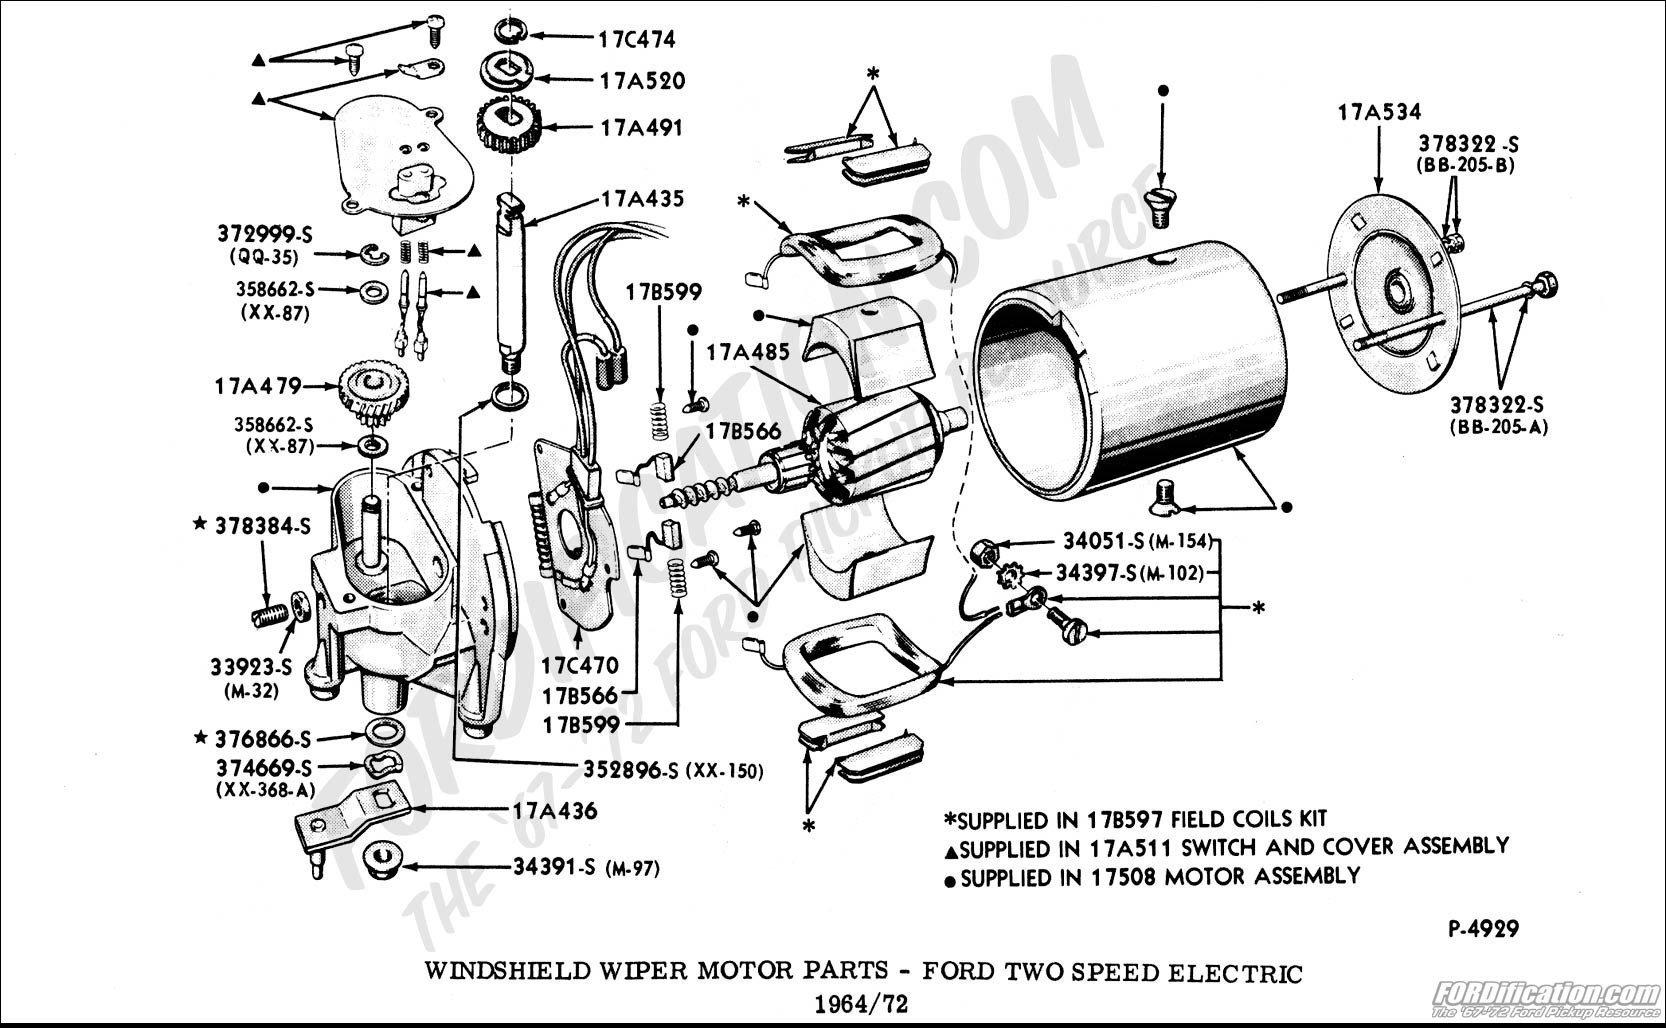 1986 ford ranger wiring diagram boss snow plow truck side آشنایی و عیب یابی سیستم الکترونیک برف پاک کن | z4car